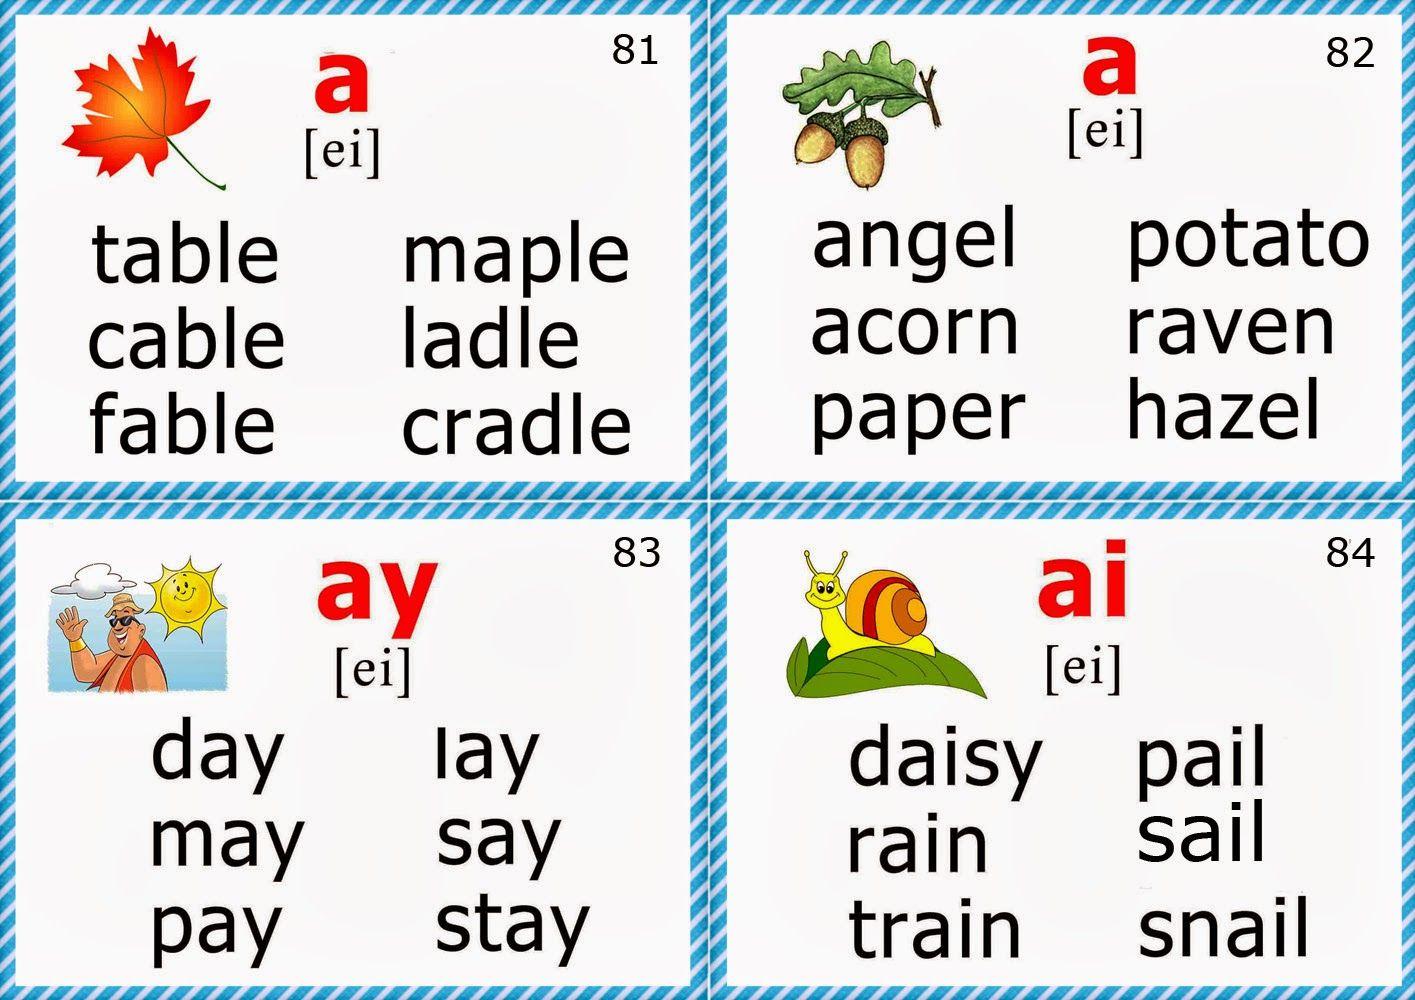 phonics flashcards for teaching English long a sound | english ...